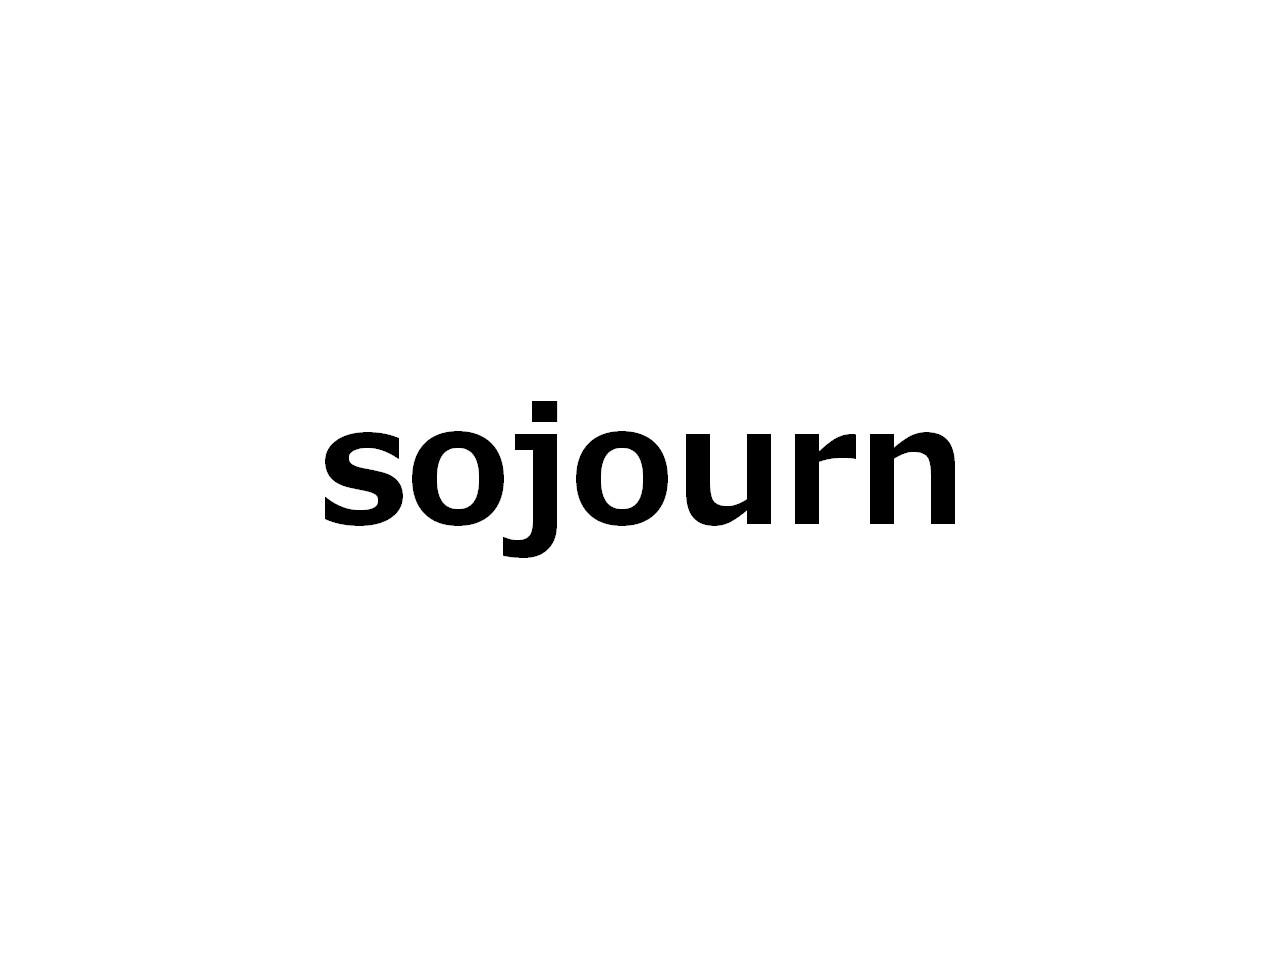 sojourn の意味と簡単な使い方【例文付き】